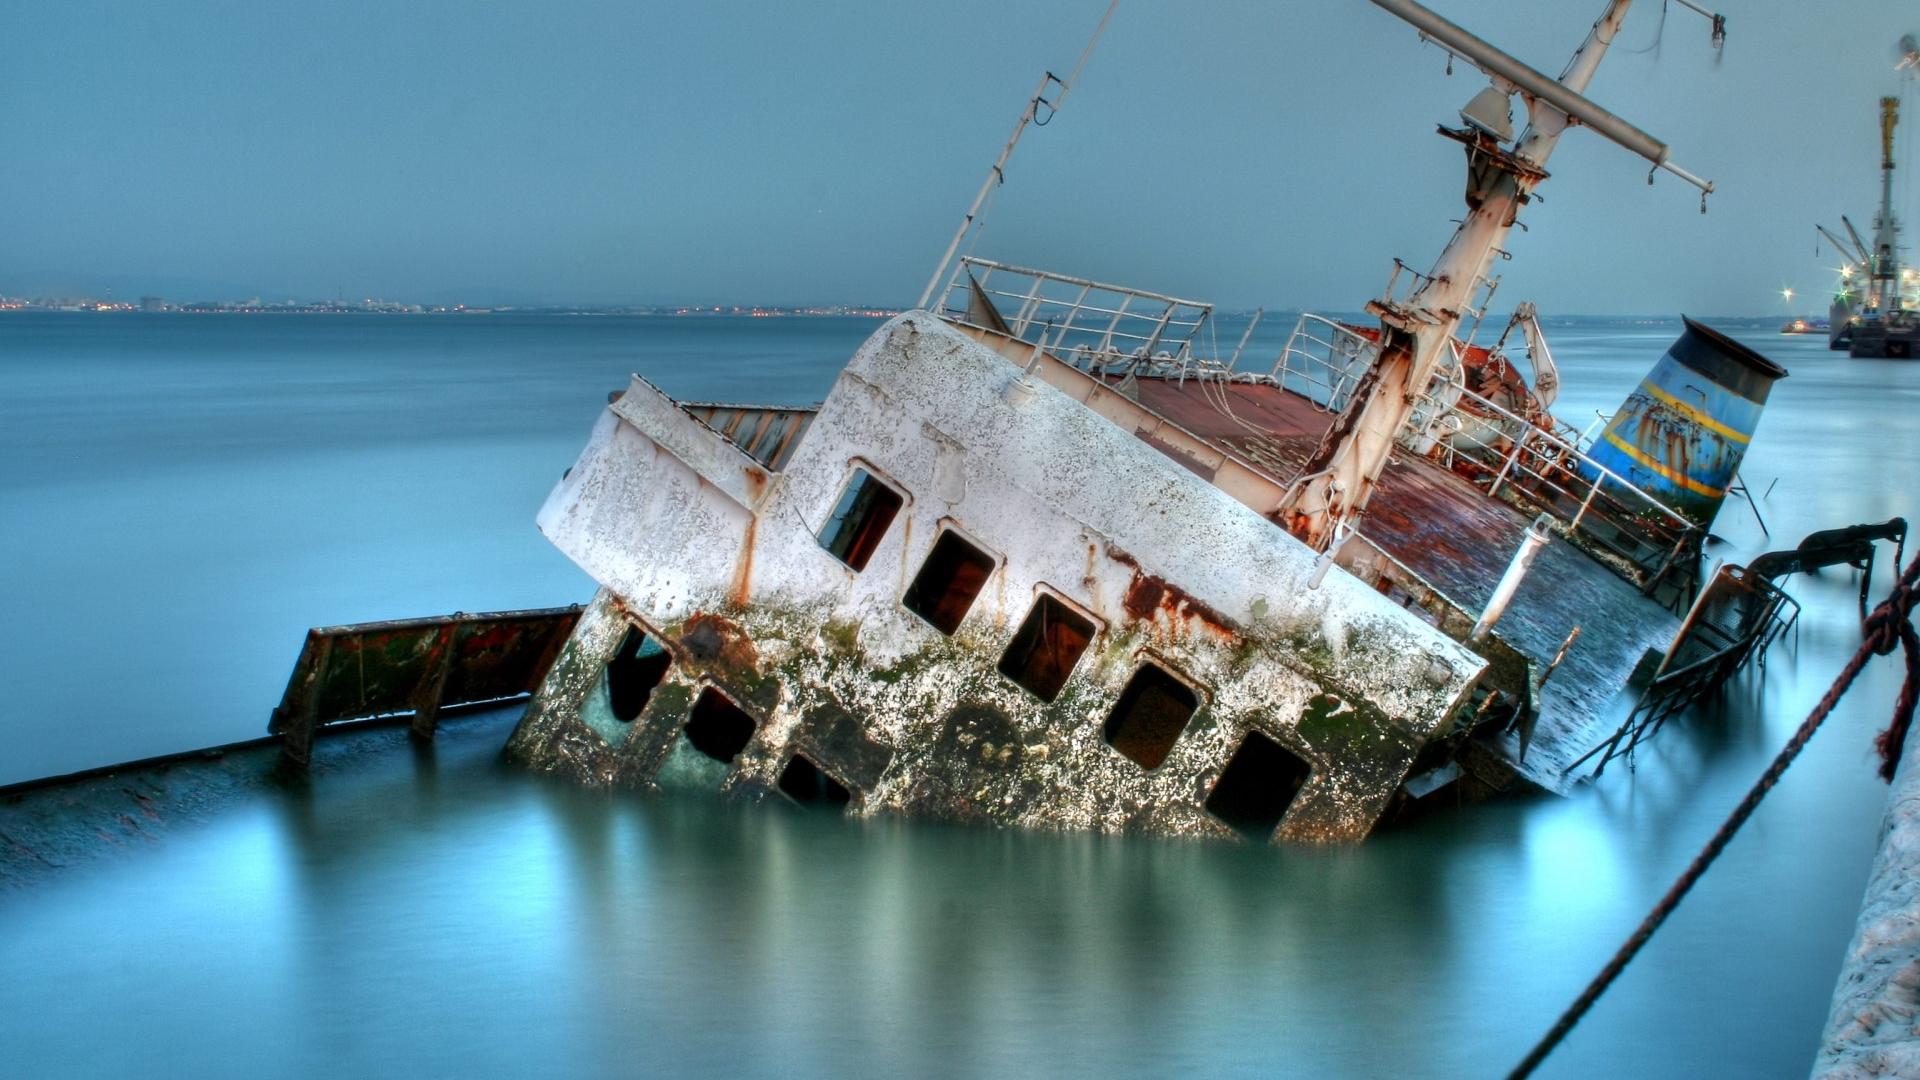 Pictures of sunken ships